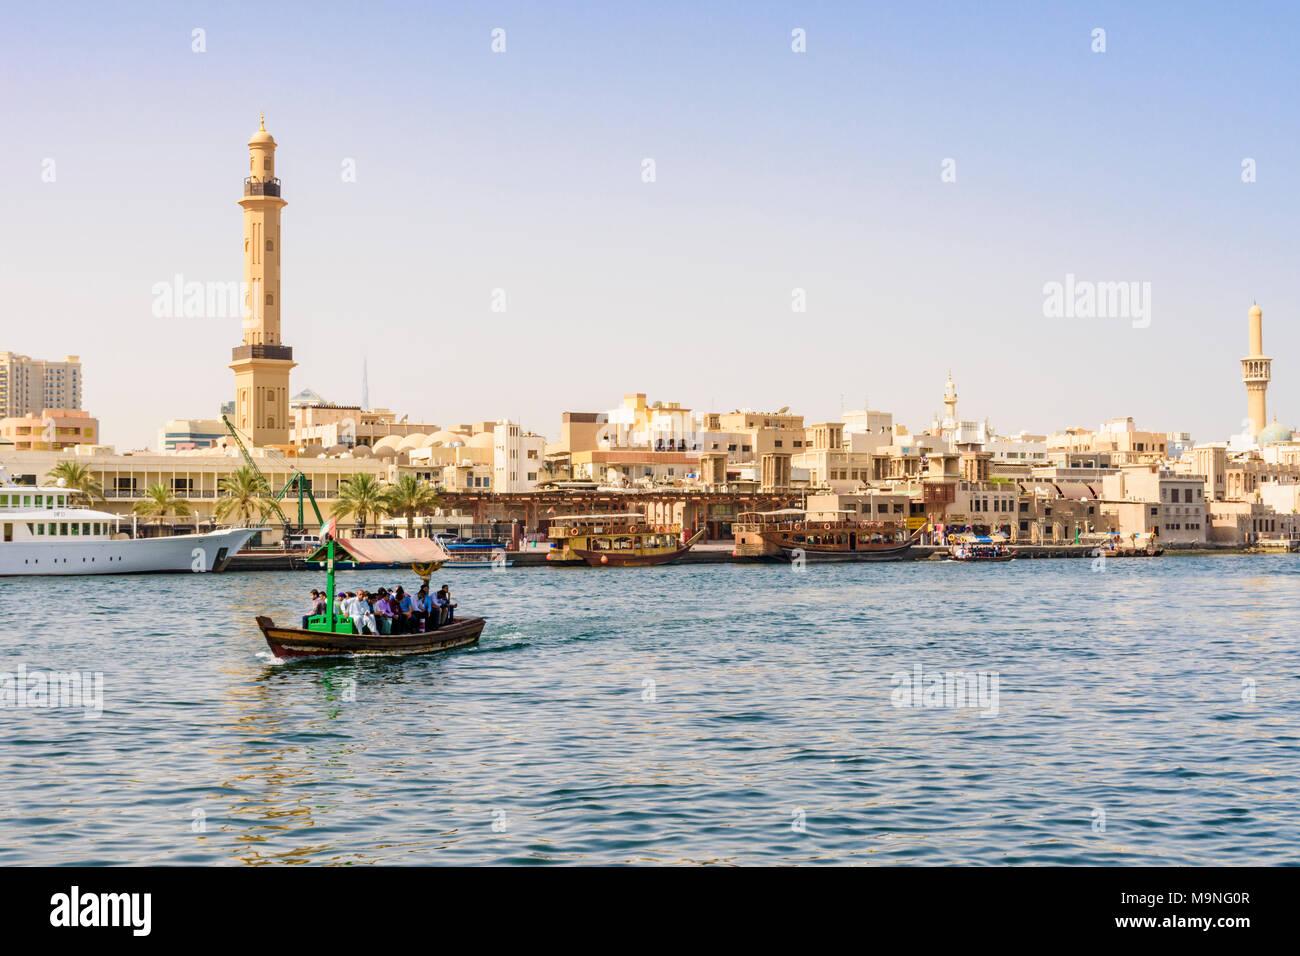 Dubai Creek abra Boot mit Blick auf die Grand Mosque Minaret, Dubai Creek, Dubai, VAE Stockbild